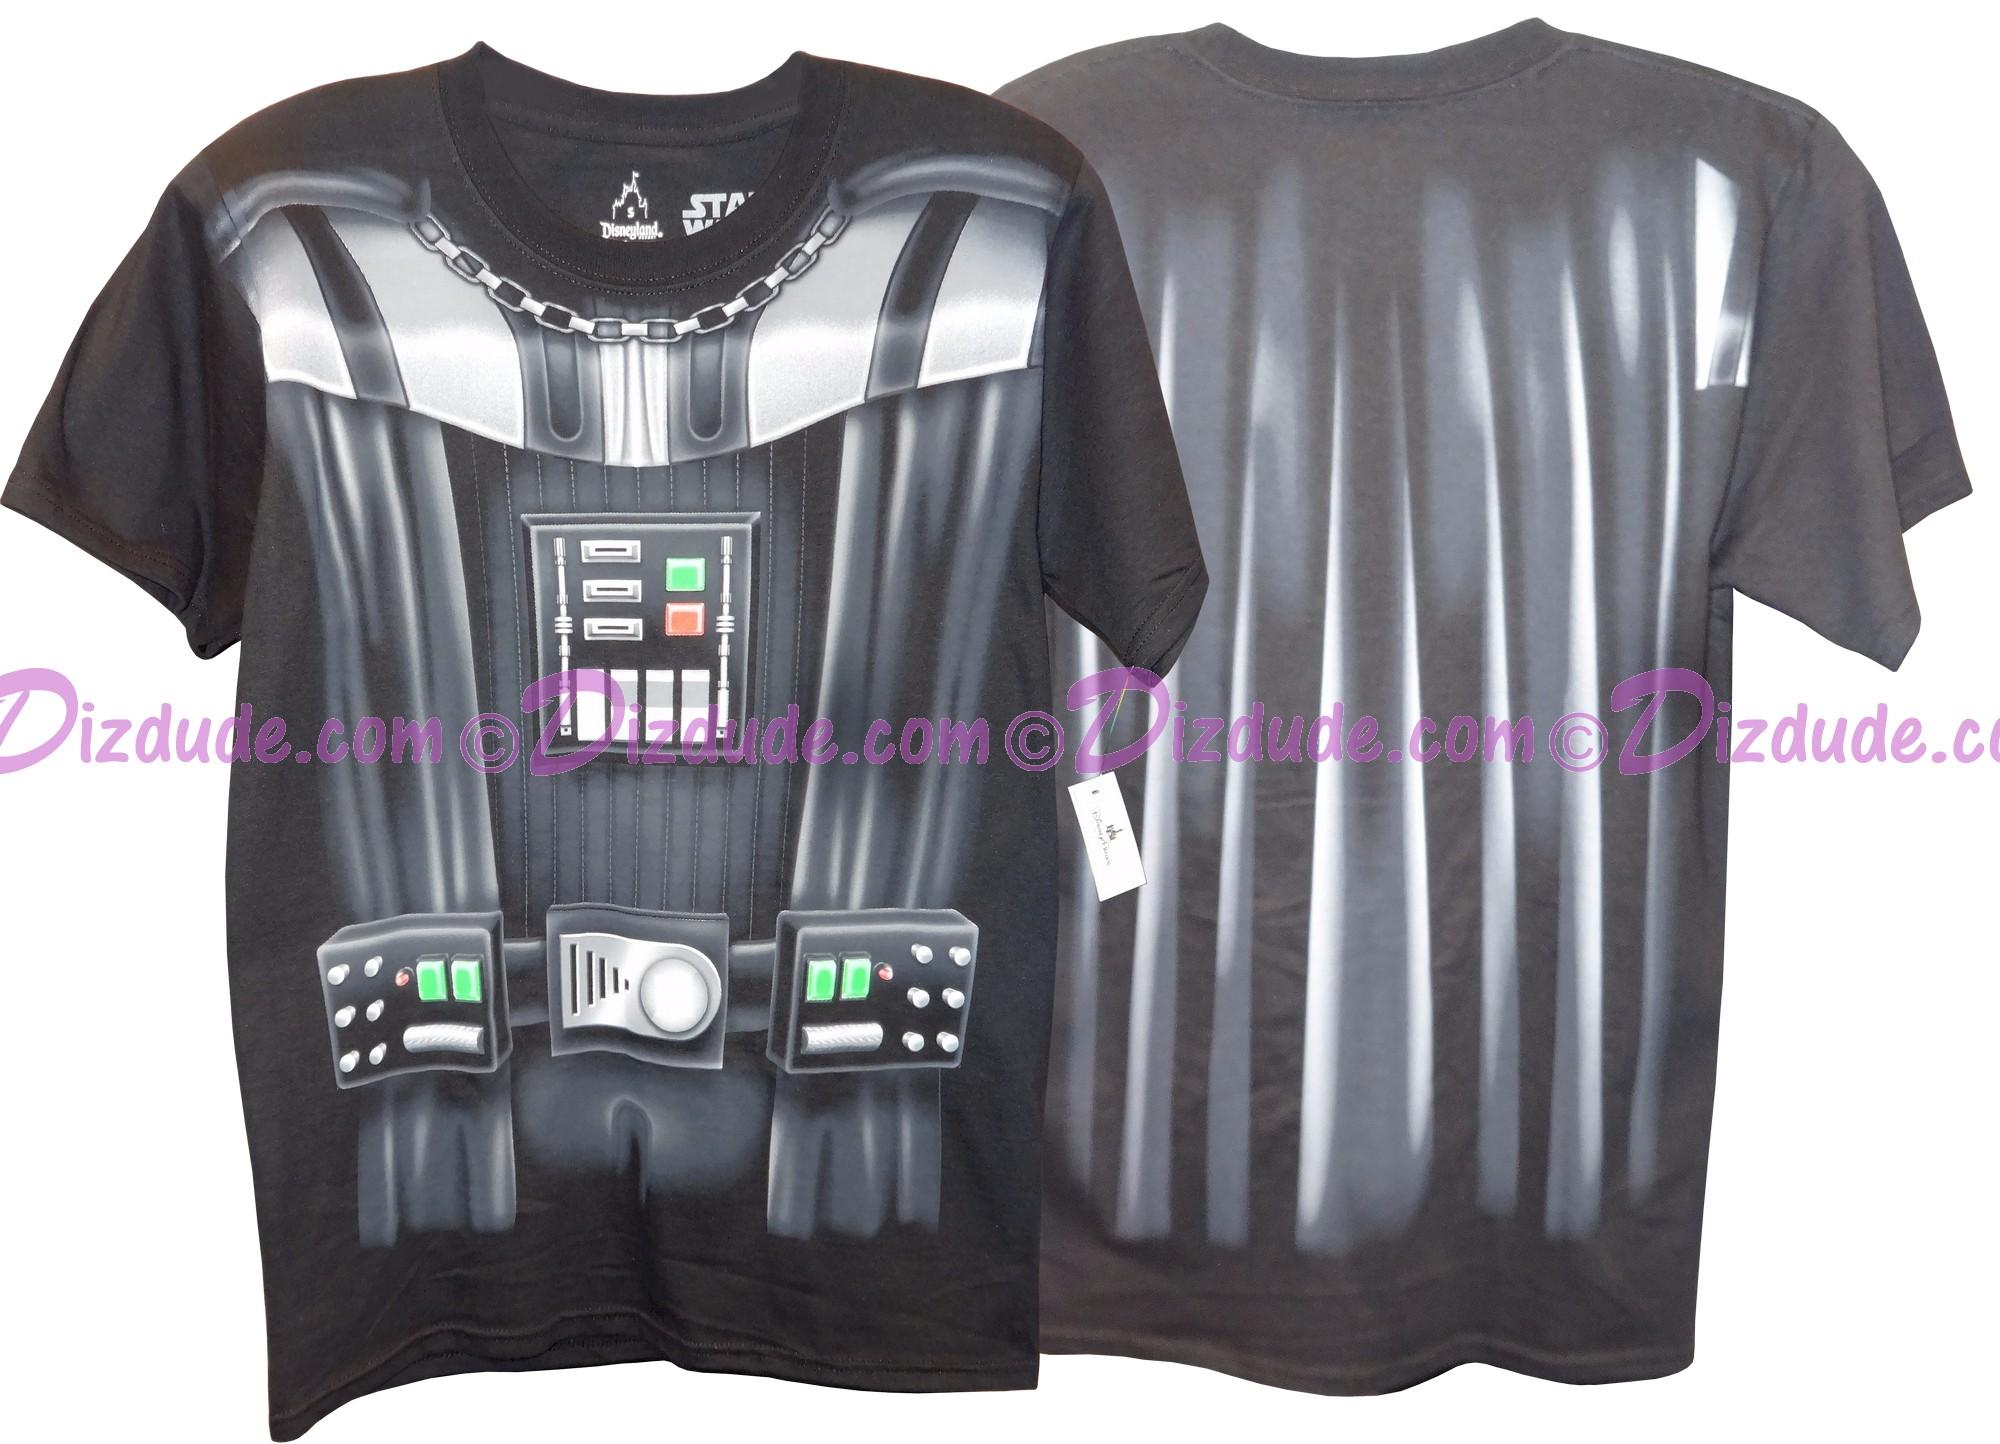 Disney Star Wars Darth Vader Armour Adult T-Shirt (Tshirt, T shirt or Tee) Printed Front & Back © Dizdude.com